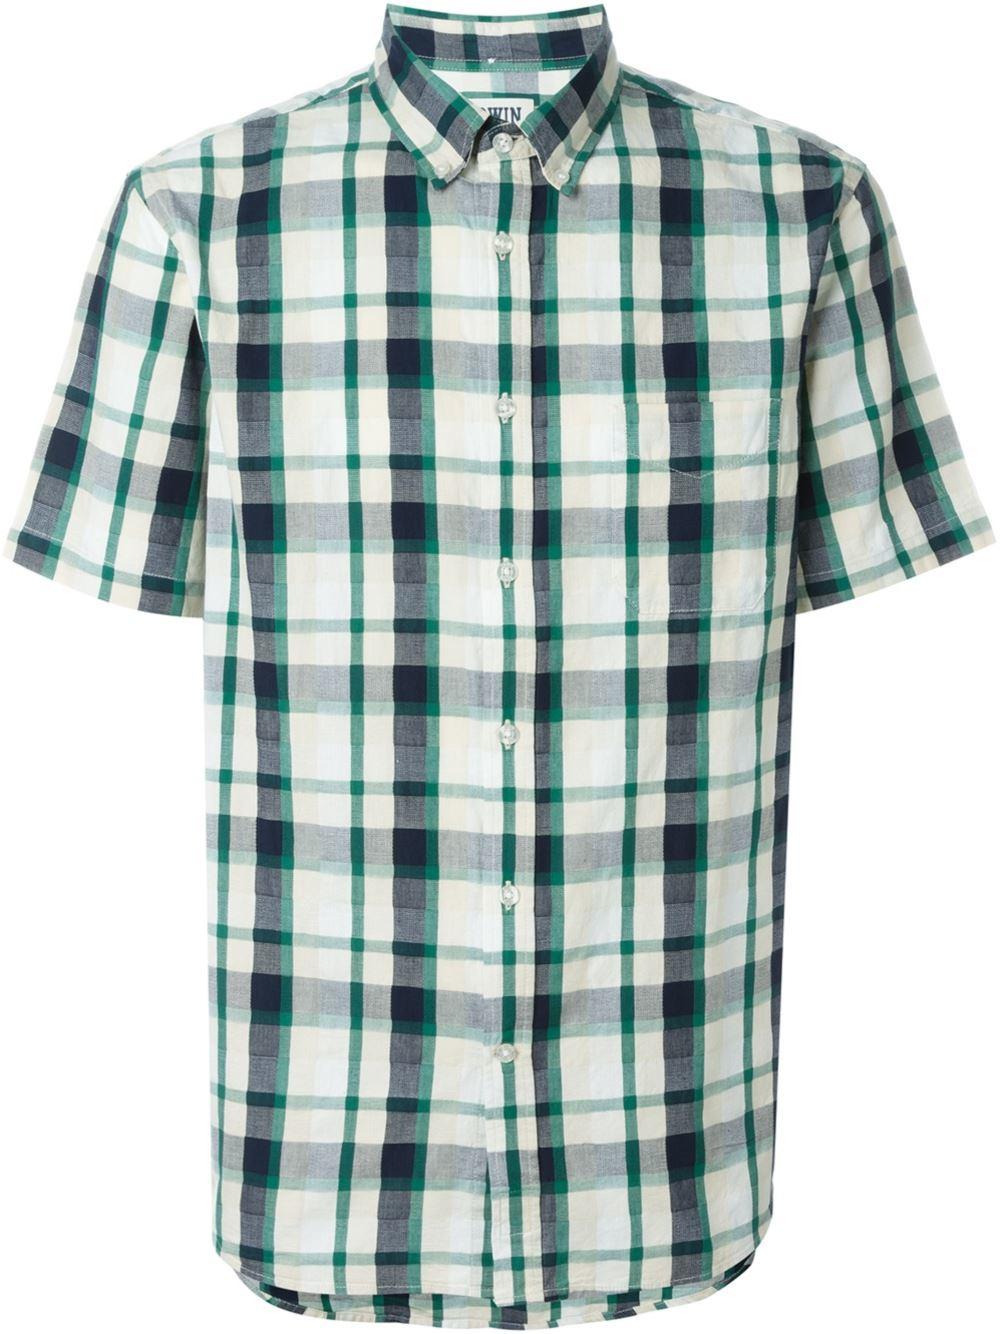 Lyst Edwin Short Sleeve Plaid Shirt In Green For Men